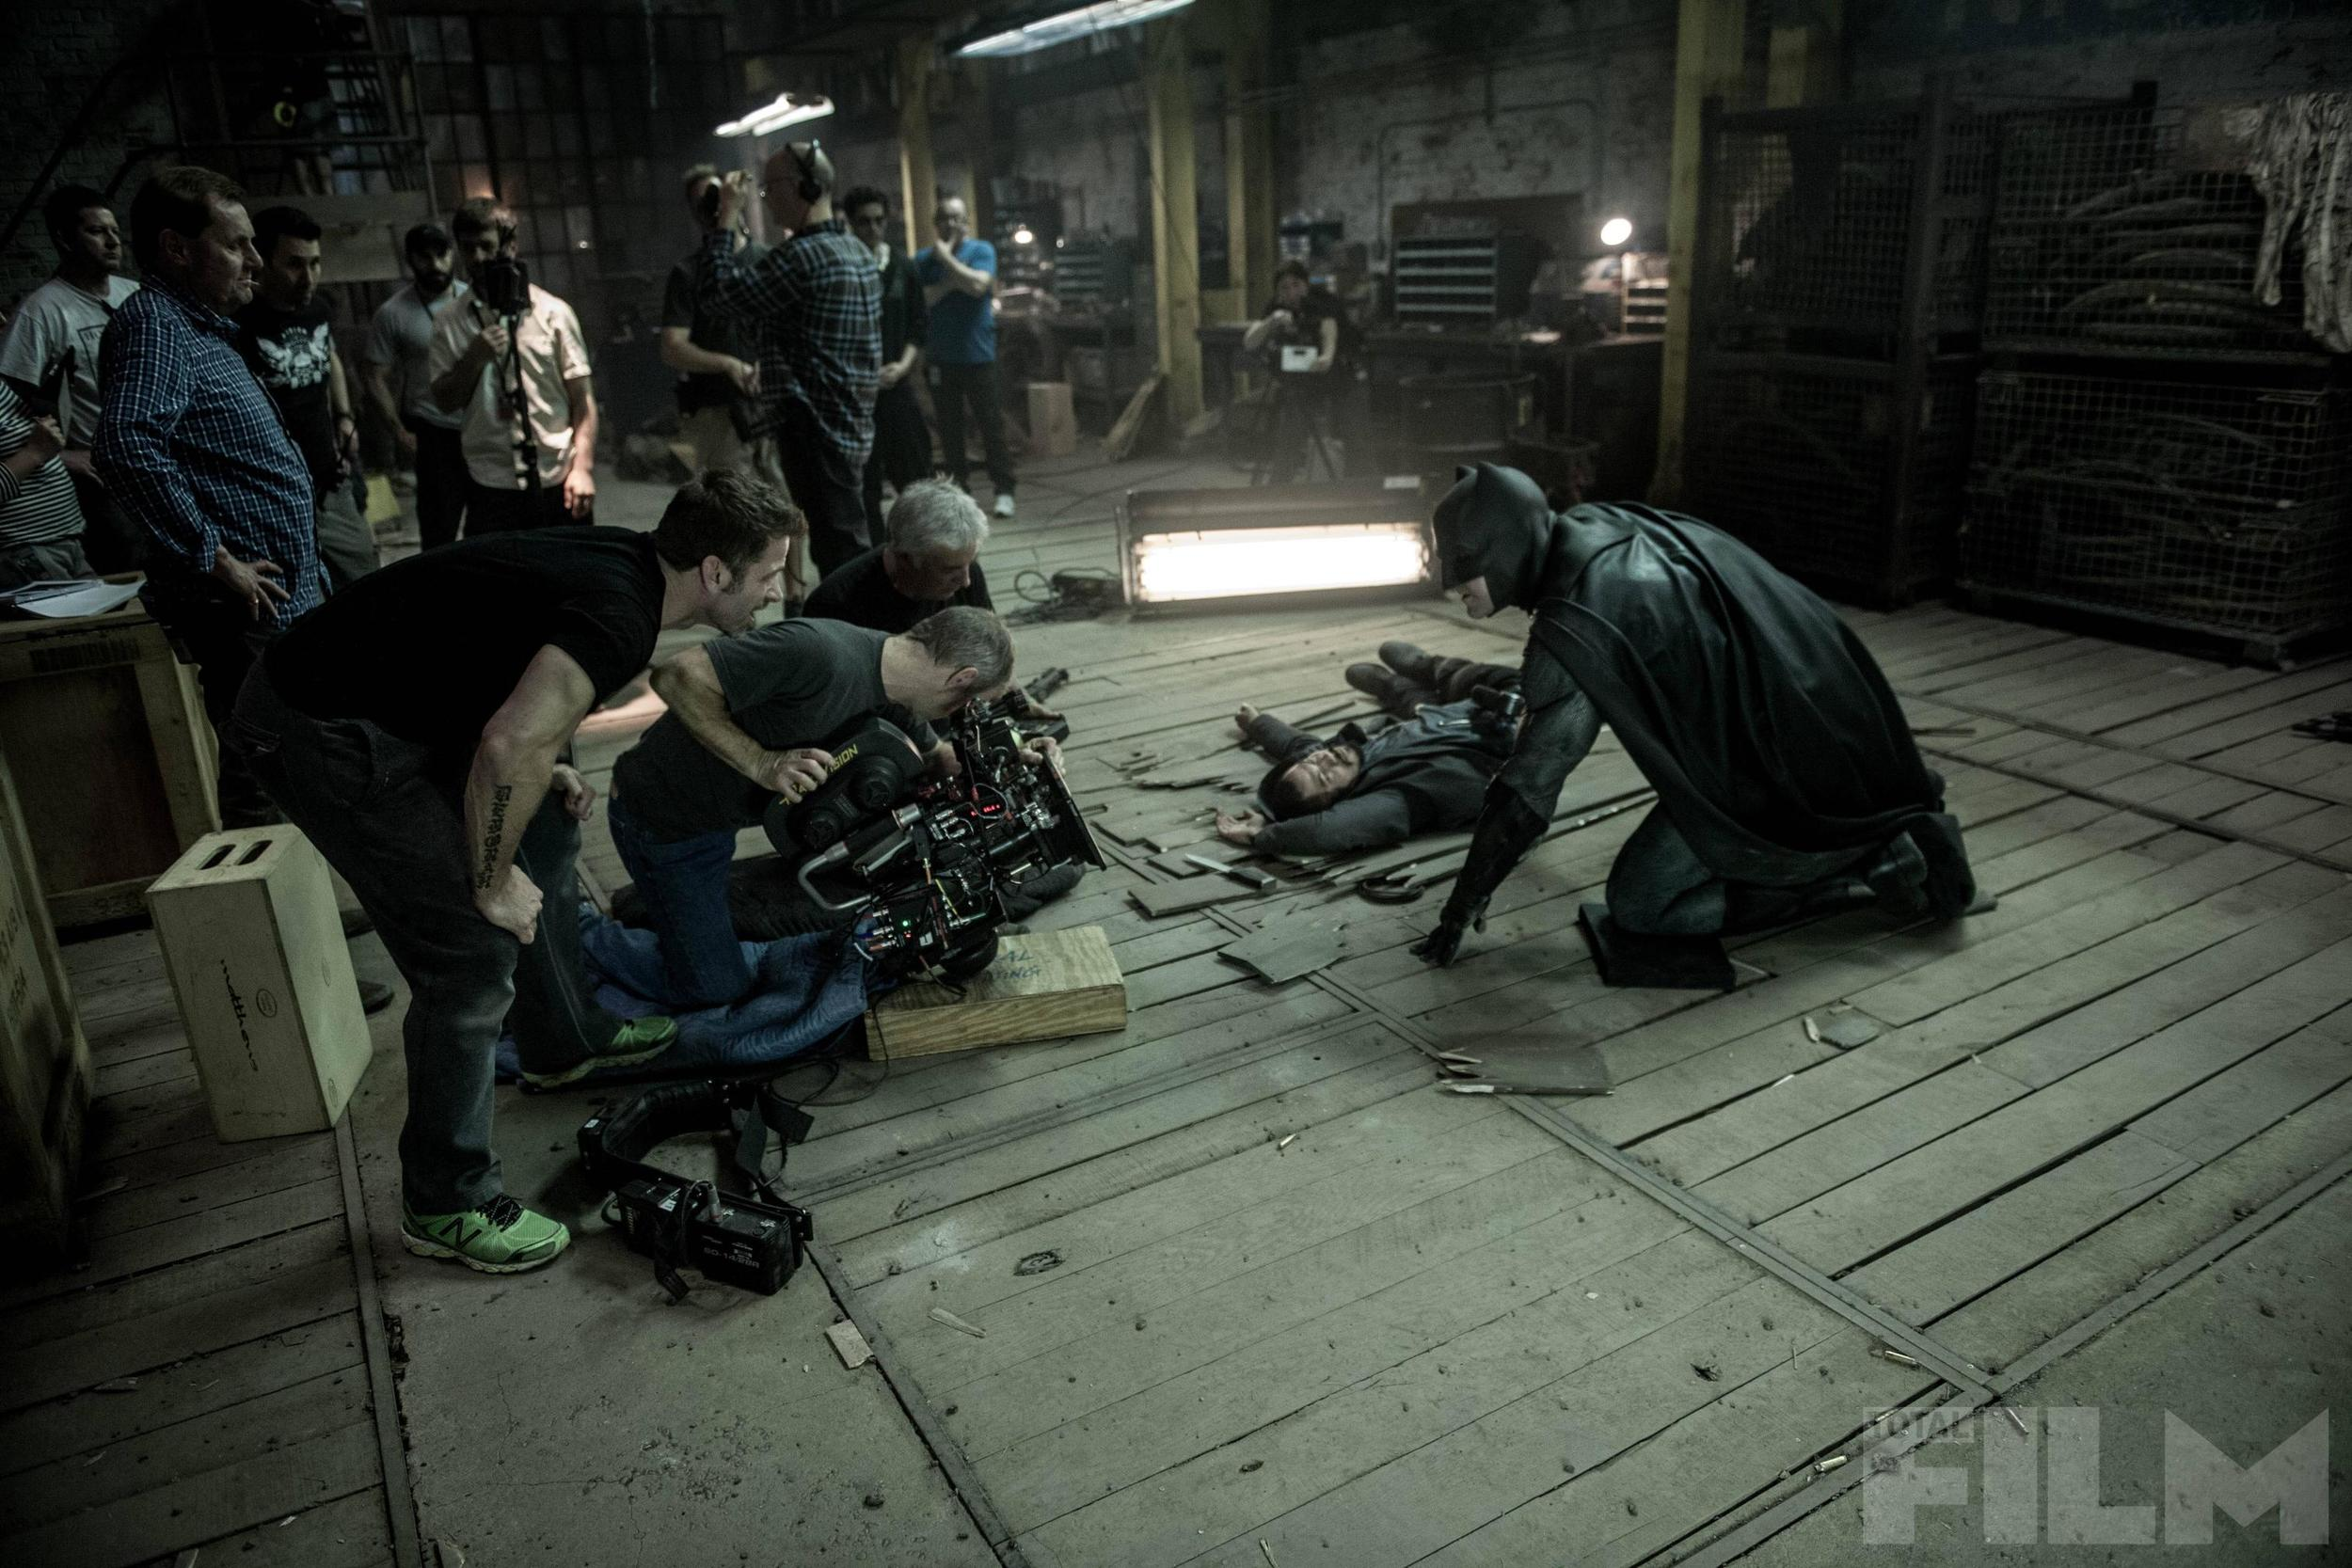 batman-v-superman-total-film-magazine-cover-and-4-photos1